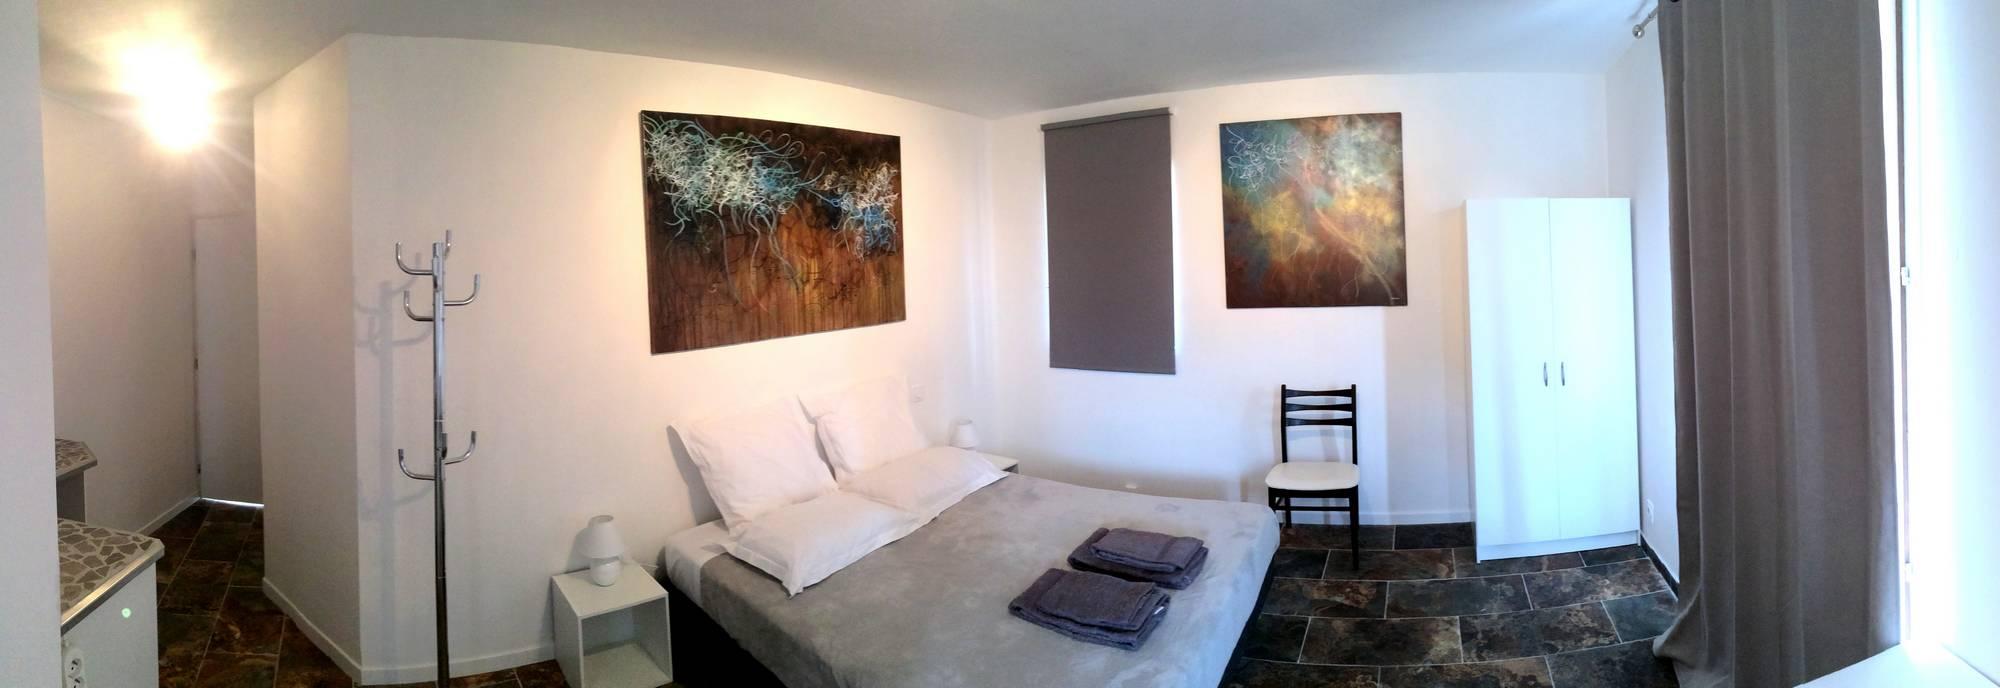 Les chambres d ilicia eus casa ilicia chambres d 39 h tes - Chambres d hotes bourgogne sud ...